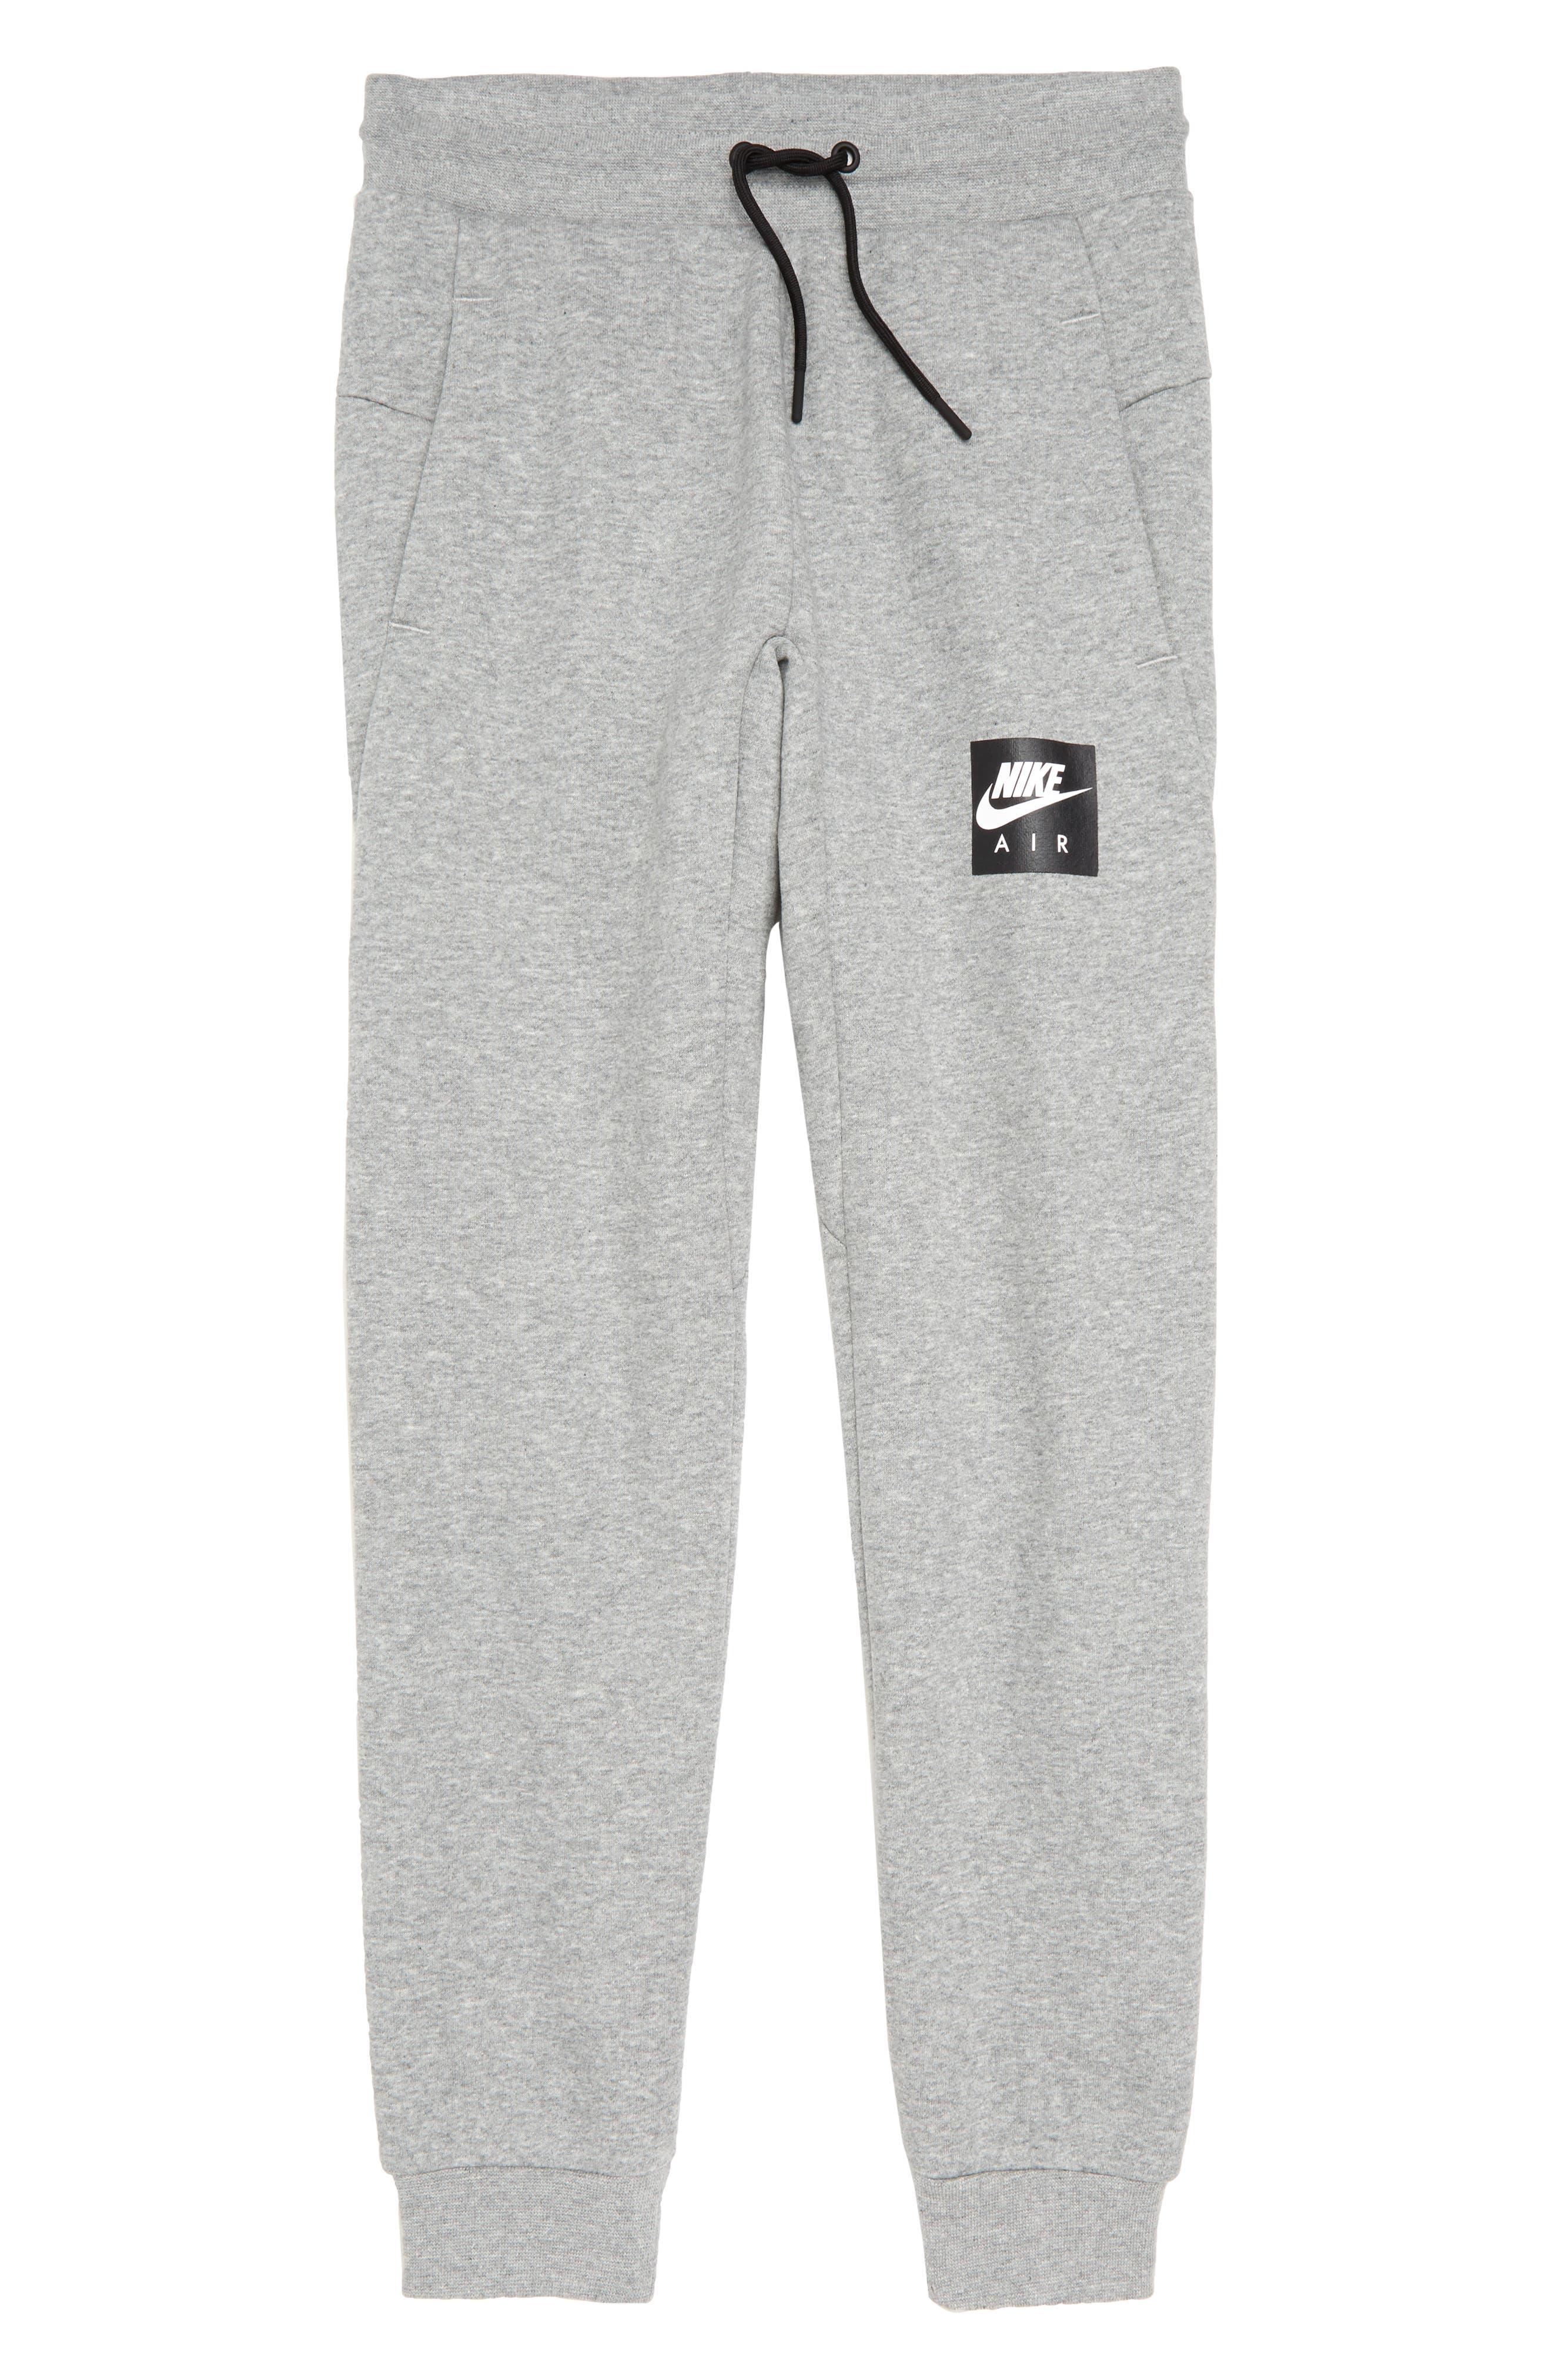 Air Fleece Jogger Pants,                         Main,                         color, DARK GREY HEATHER